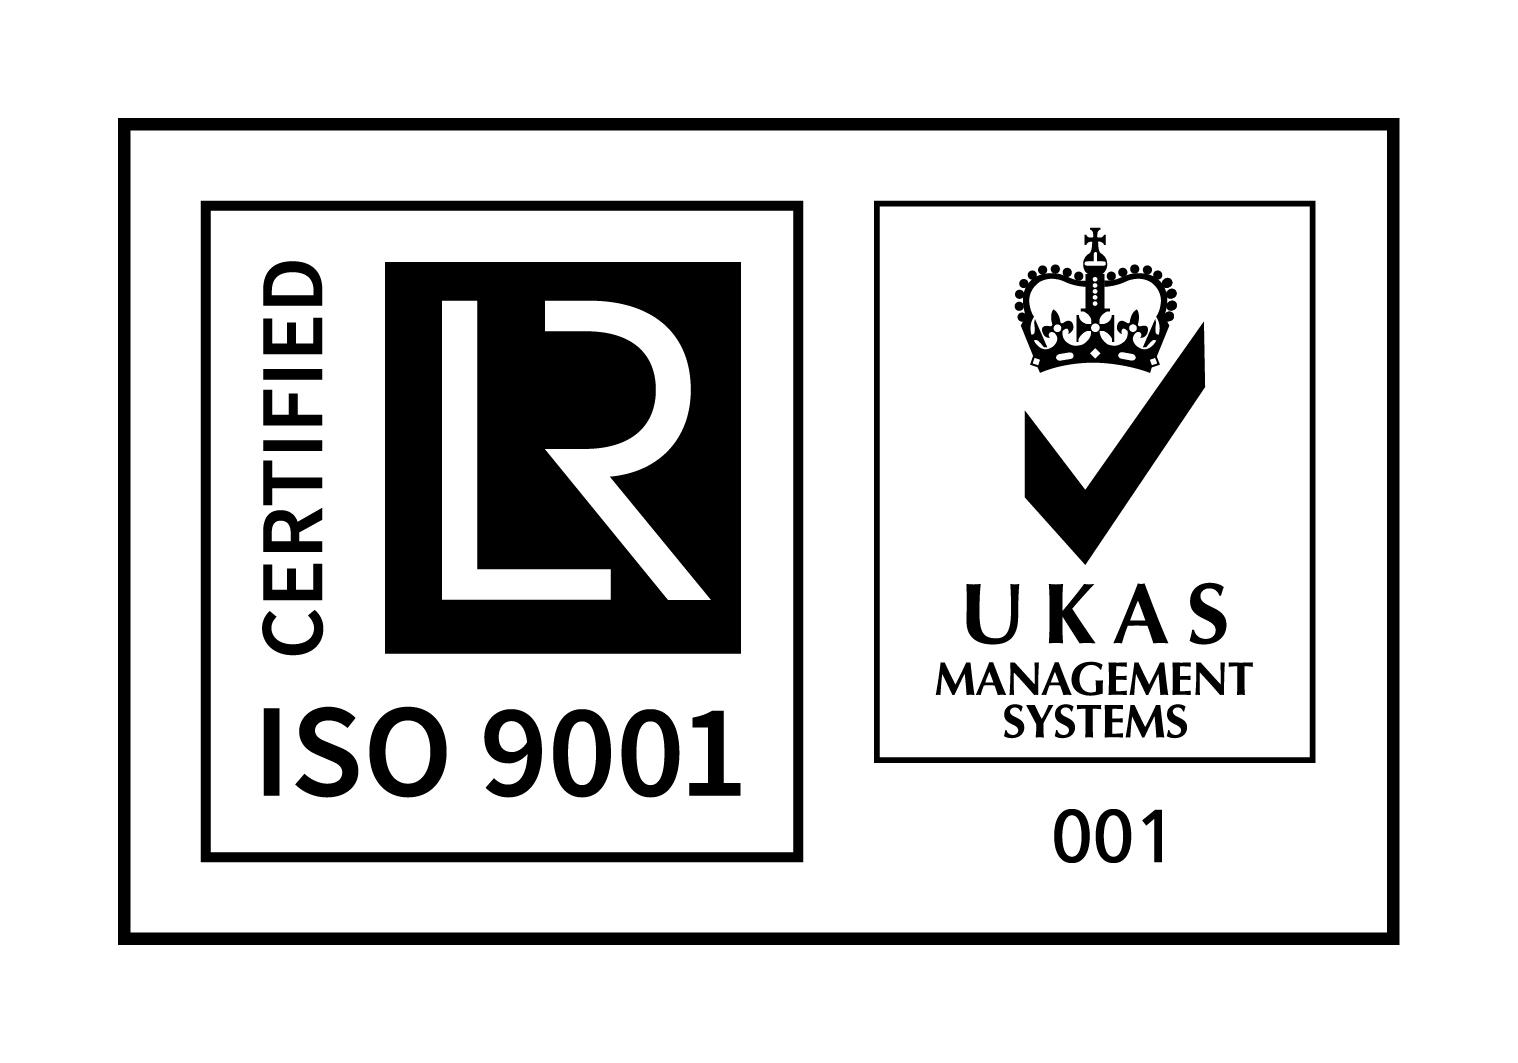 ISO9001 UKAS